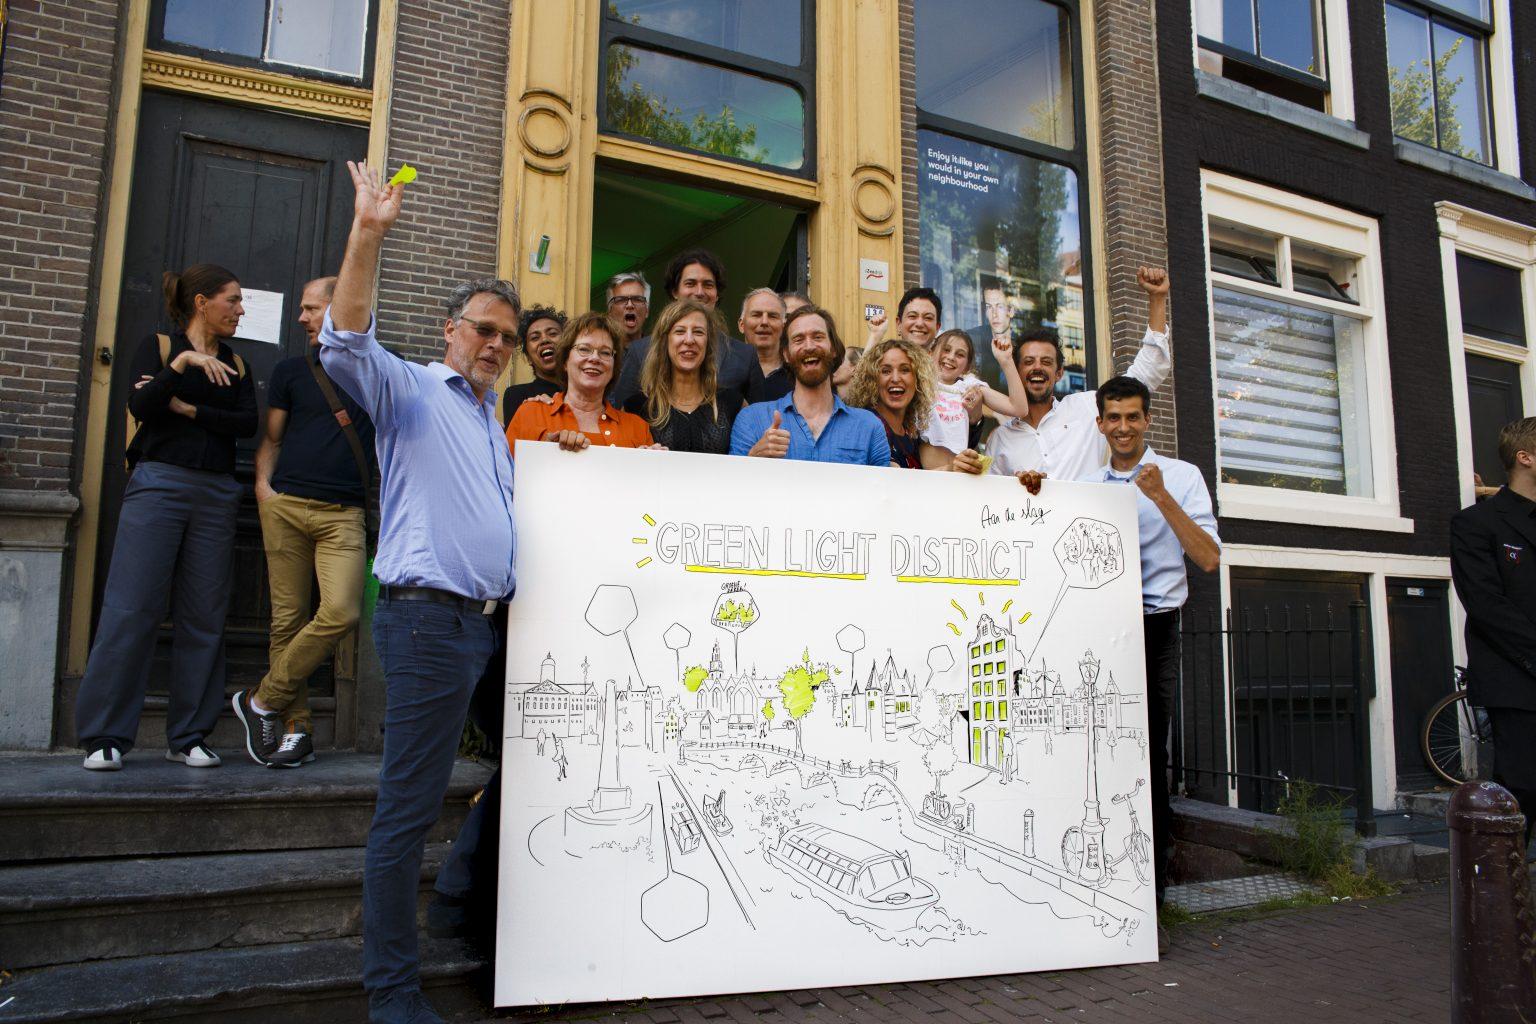 Green Light District - Header image Over ons